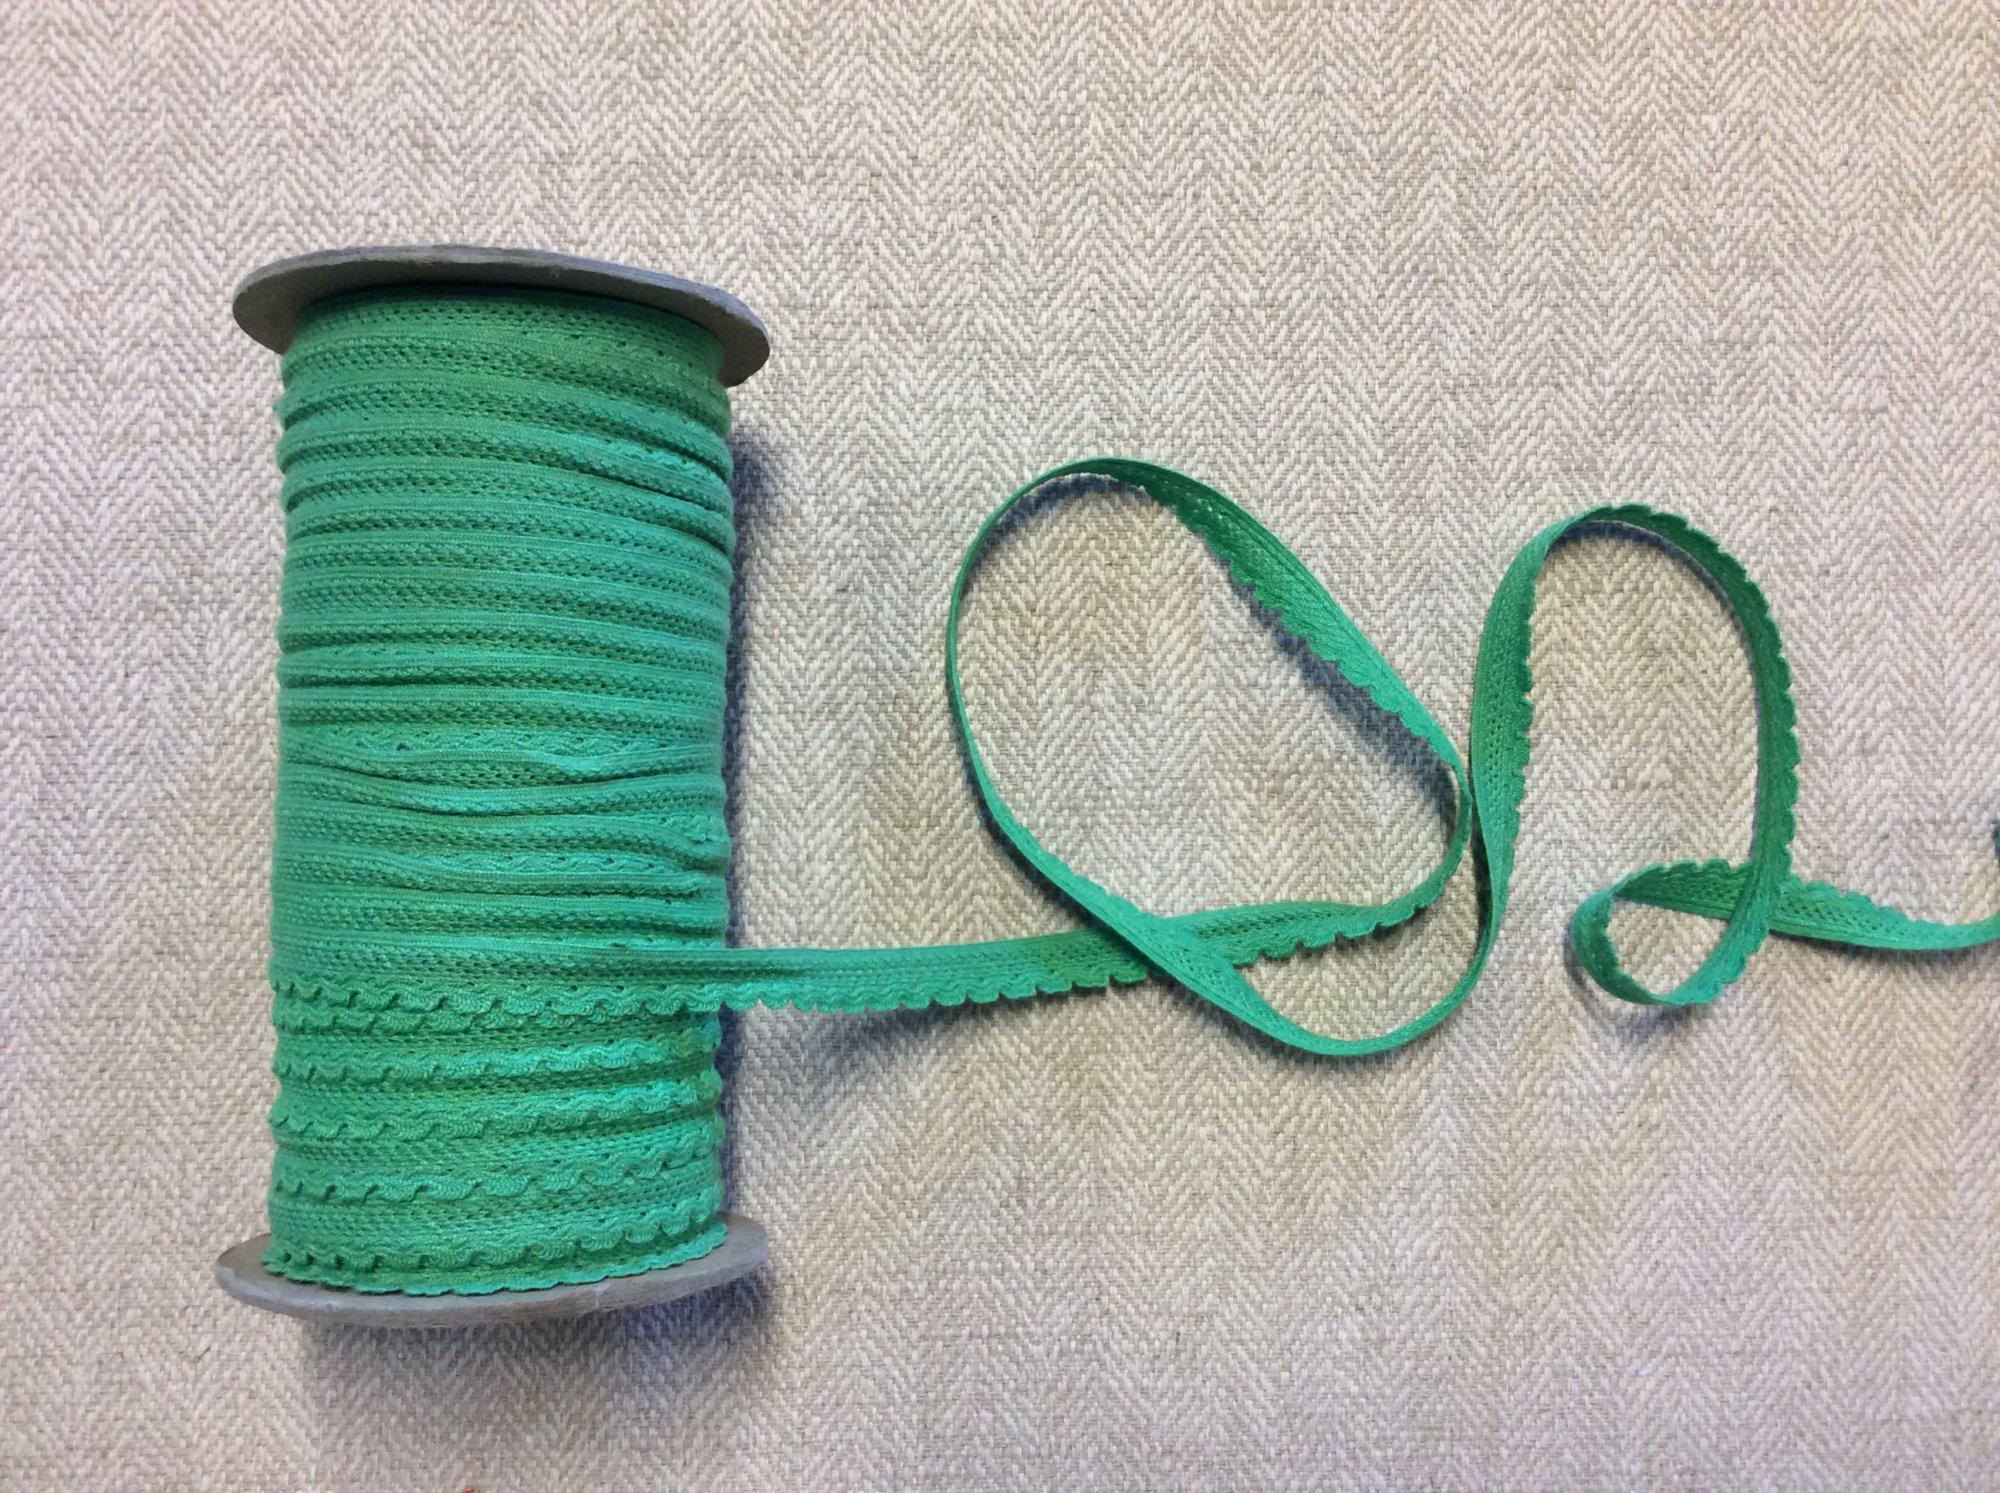 True Vintage 1970s Green Scalloped Trim Spool Apparel Tape TRIM956